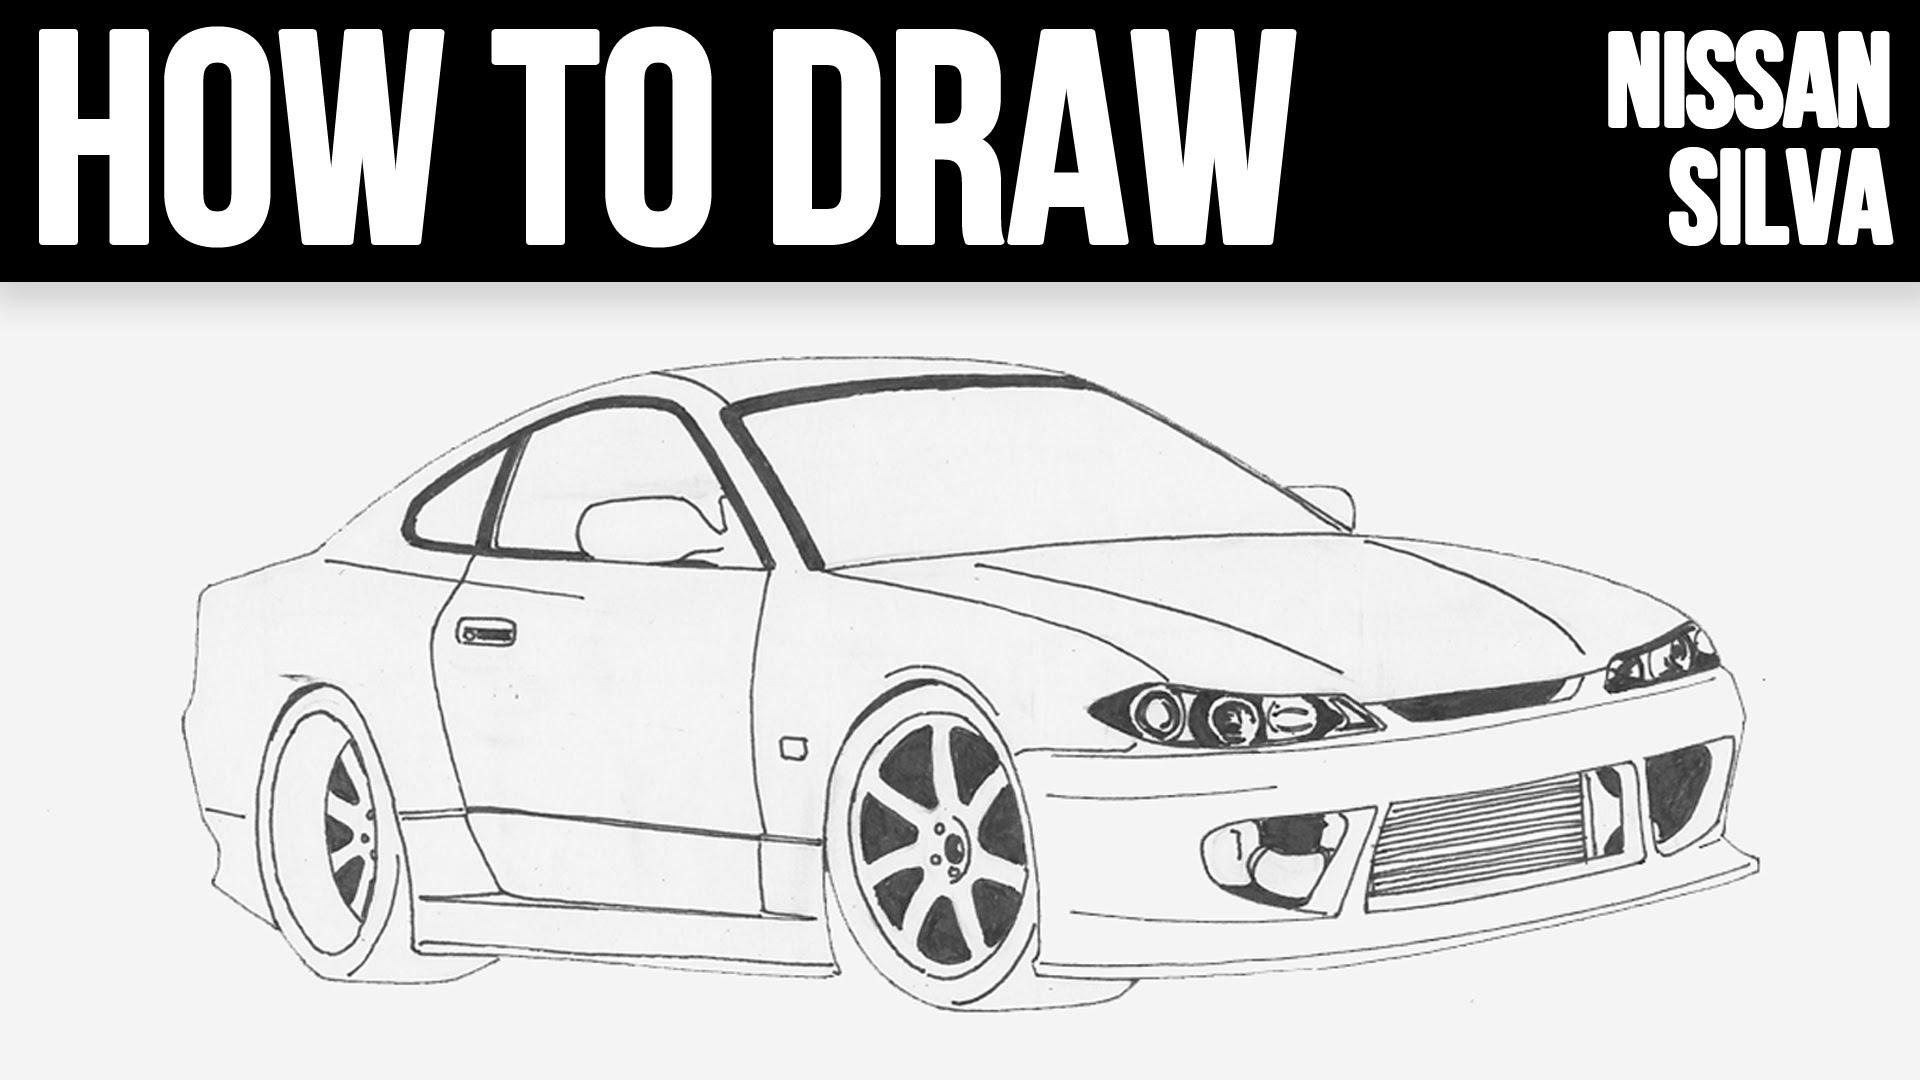 Drawn vehicle nissan TO HOW Silvia S15 Step